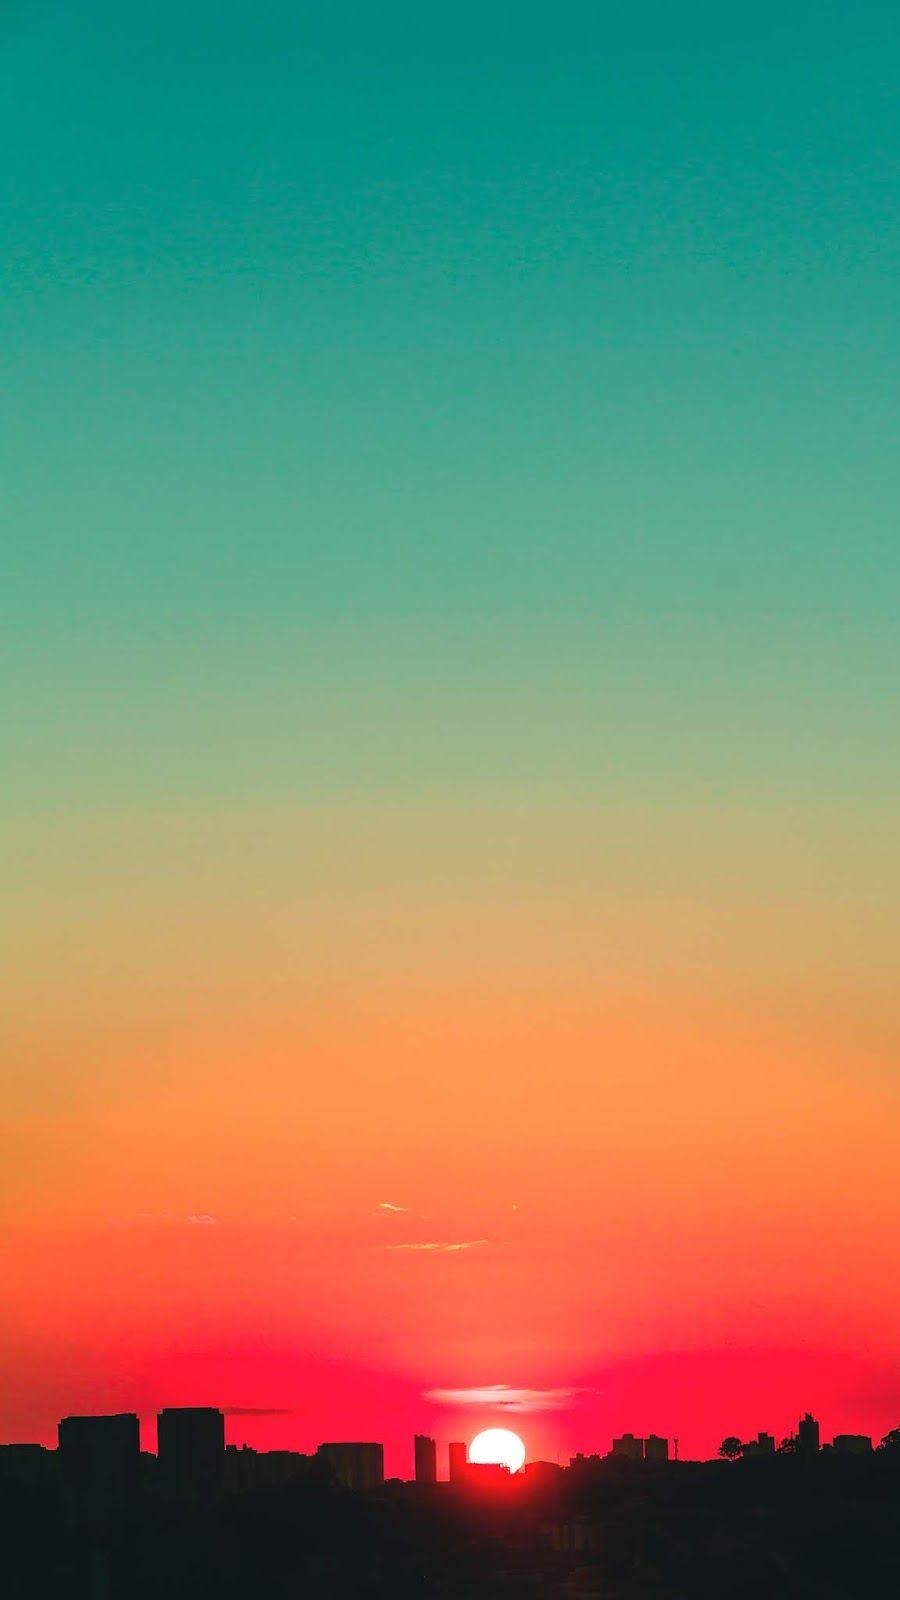 Sunset Sunset Wallpaper Sky Aesthetic Beautiful Wallpapers